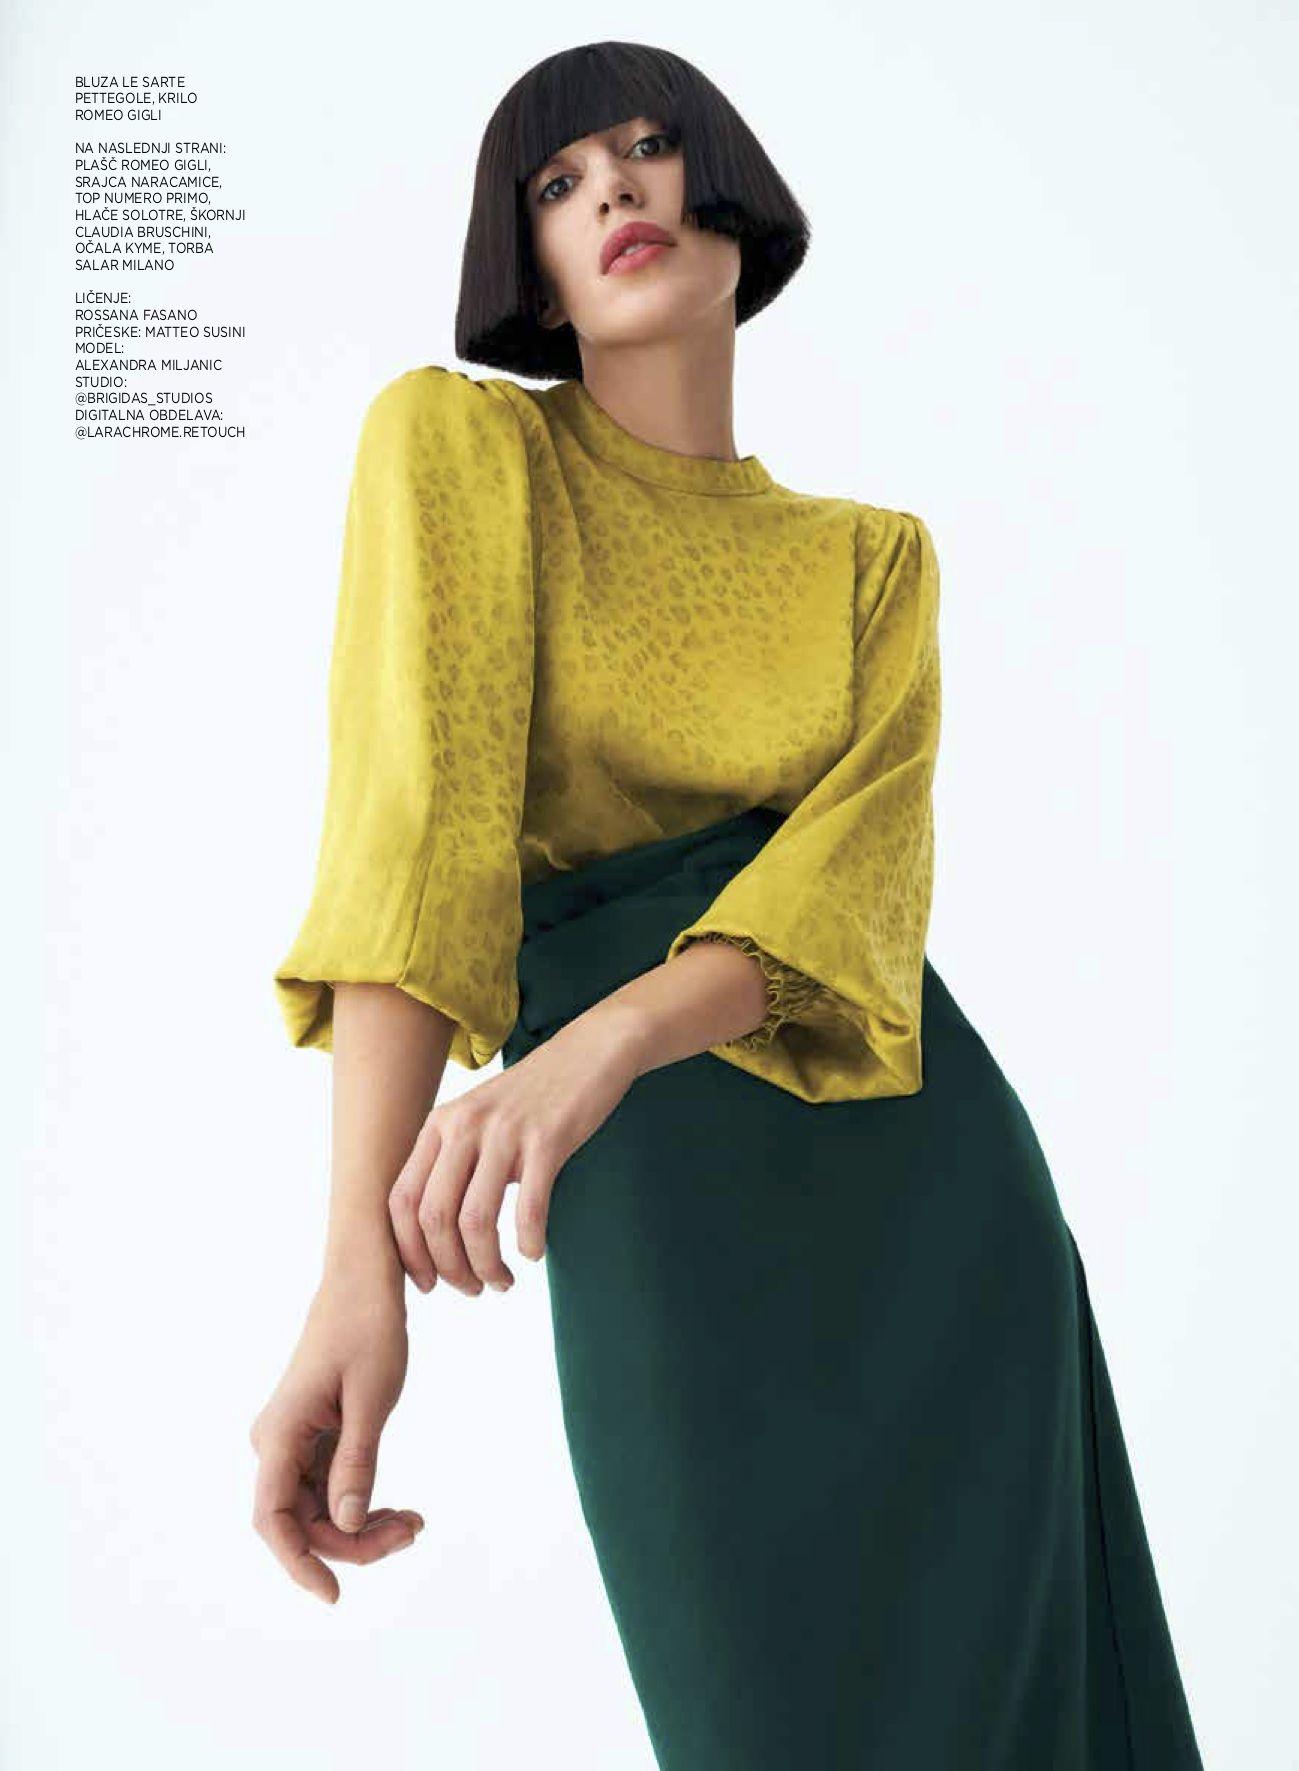 Gloss Magazine Cover - Pic. 8